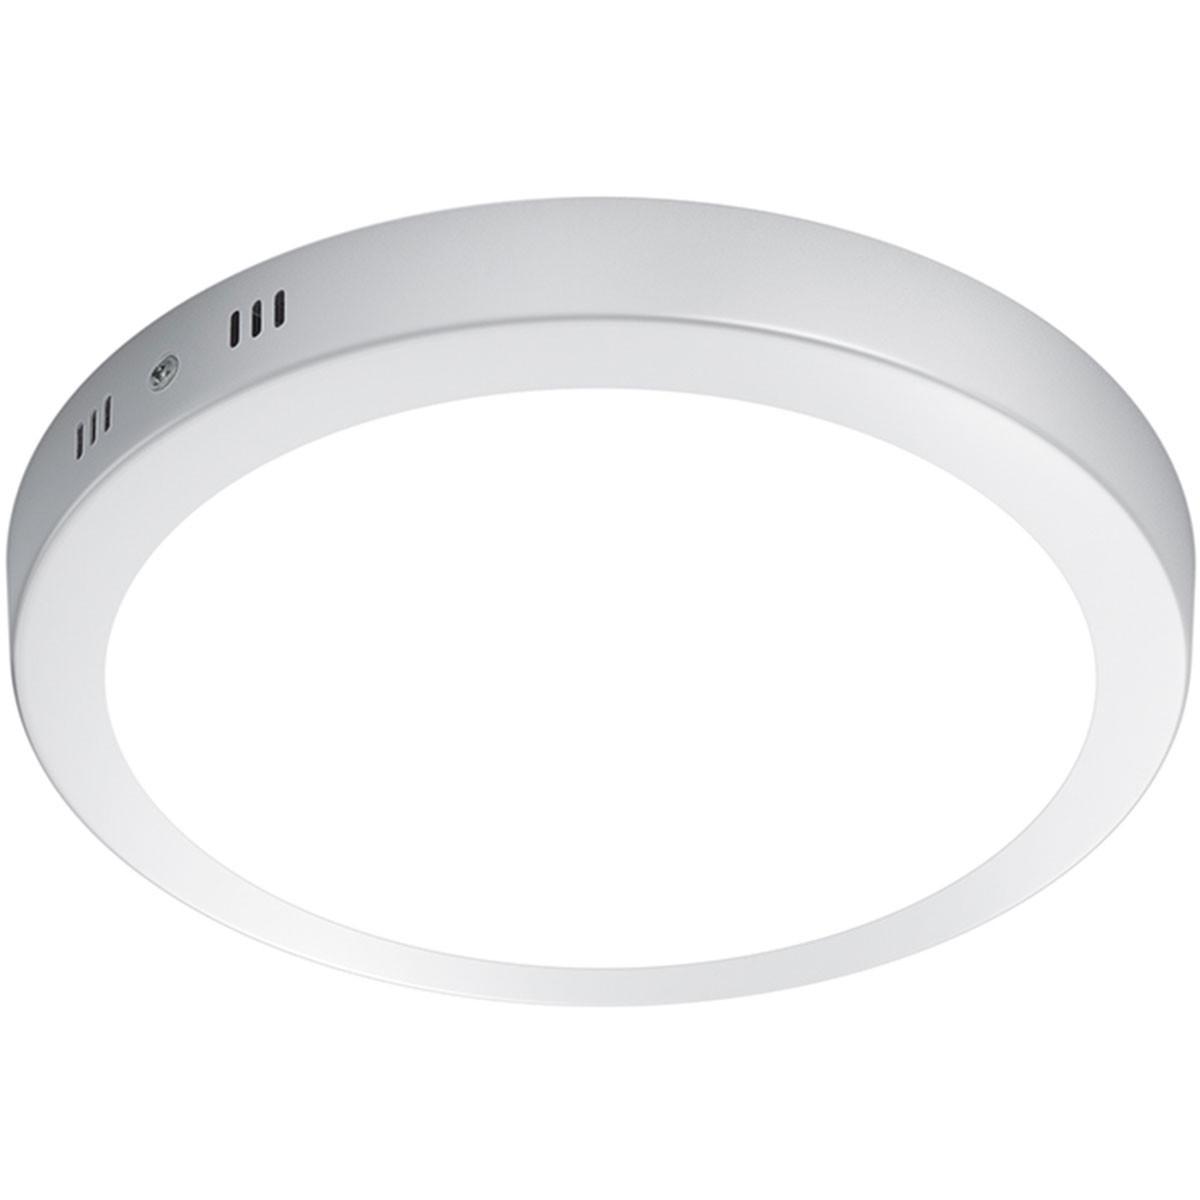 LED Plafondlamp - Plafondverlichting - Trion Sonta - 17W - Warm Wit 3000K - Rond - Mat Wit - Alumini